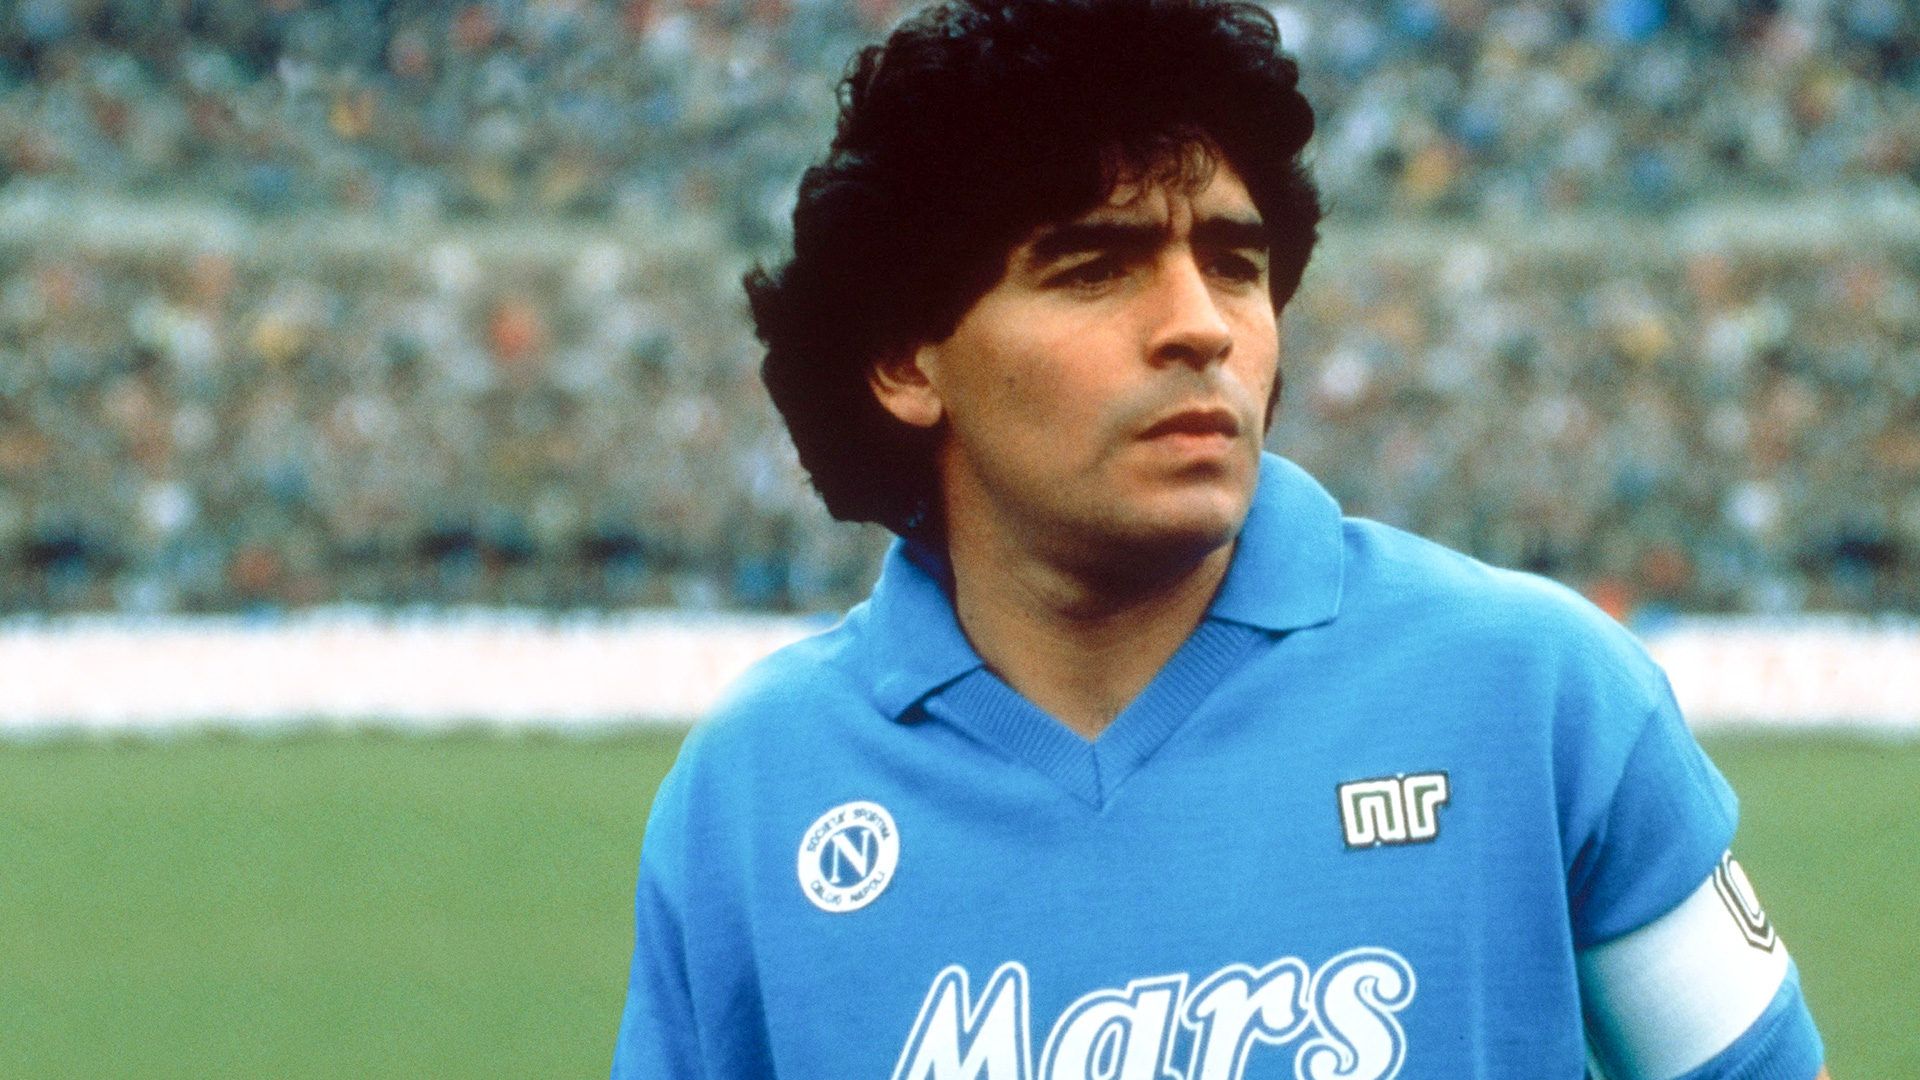 World famous football star